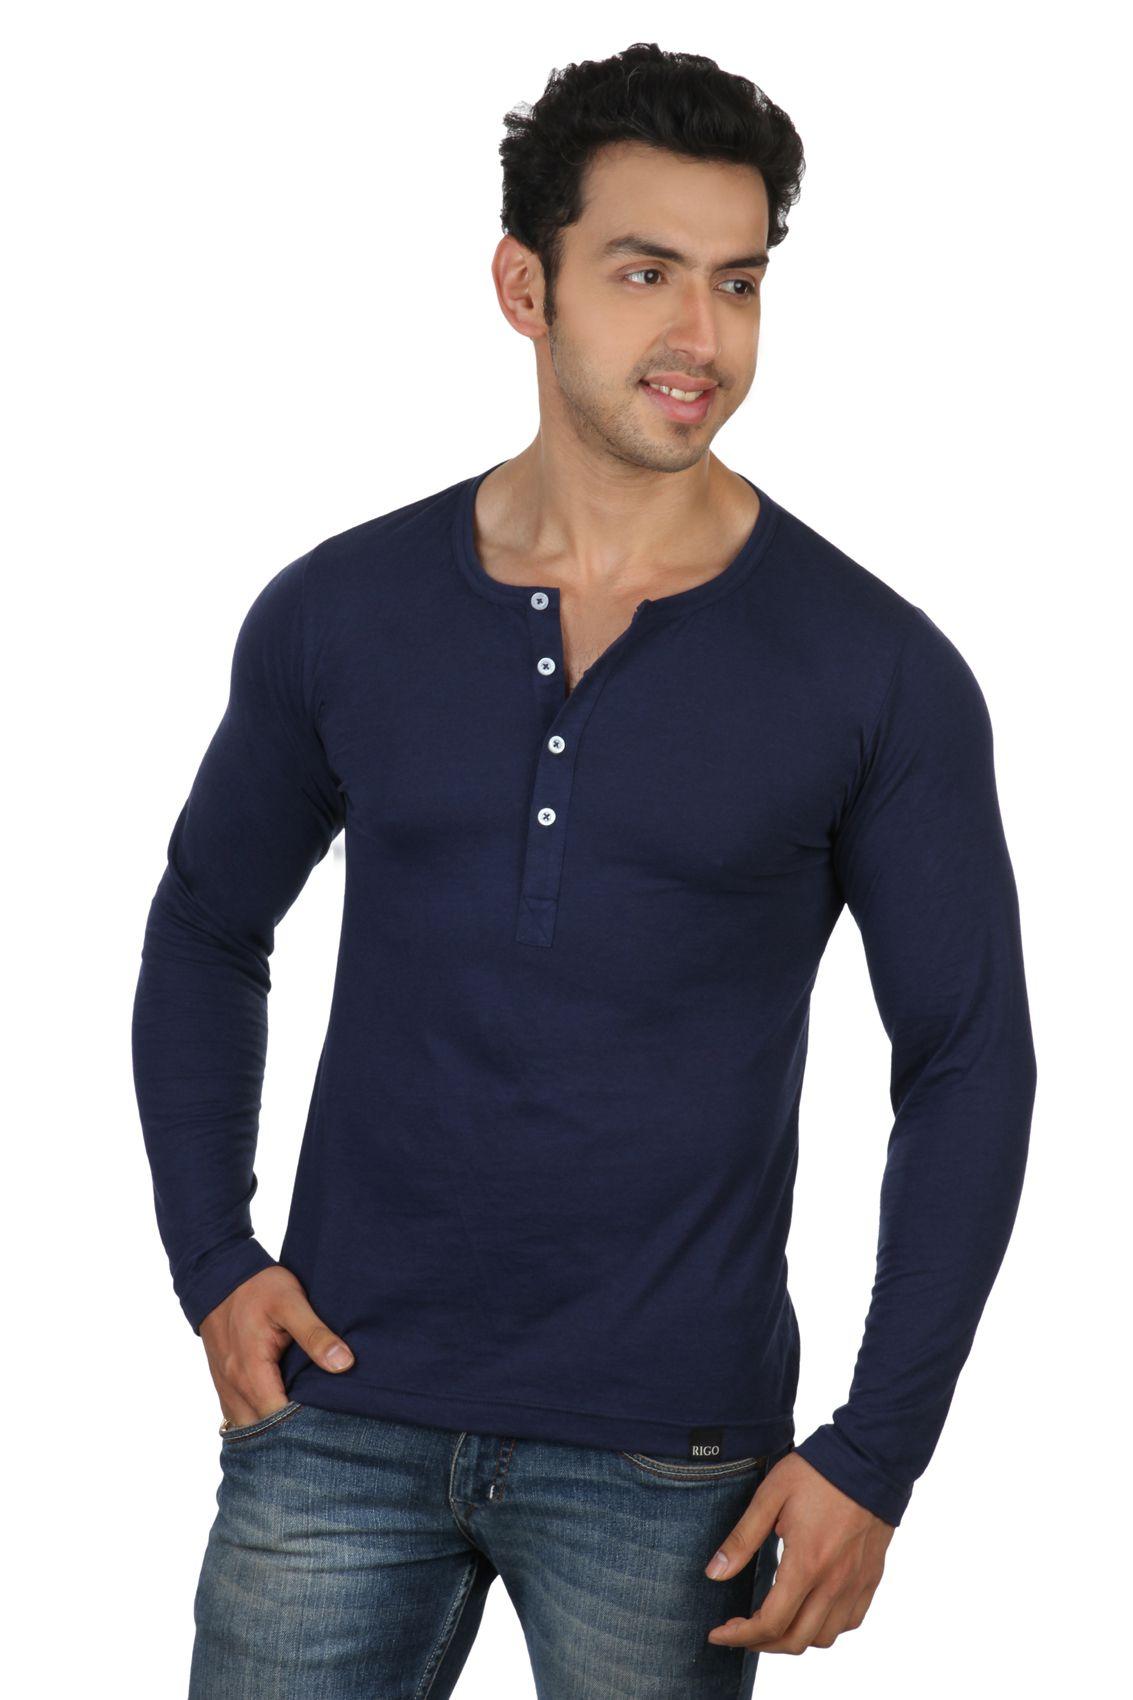 20aca9b9 Rigo Navy Blue Slim Fit Henley T-Shirt - Buy Rigo Navy Blue Slim Fit Henley  T-Shirt Online at Low Price - Snapdeal.com